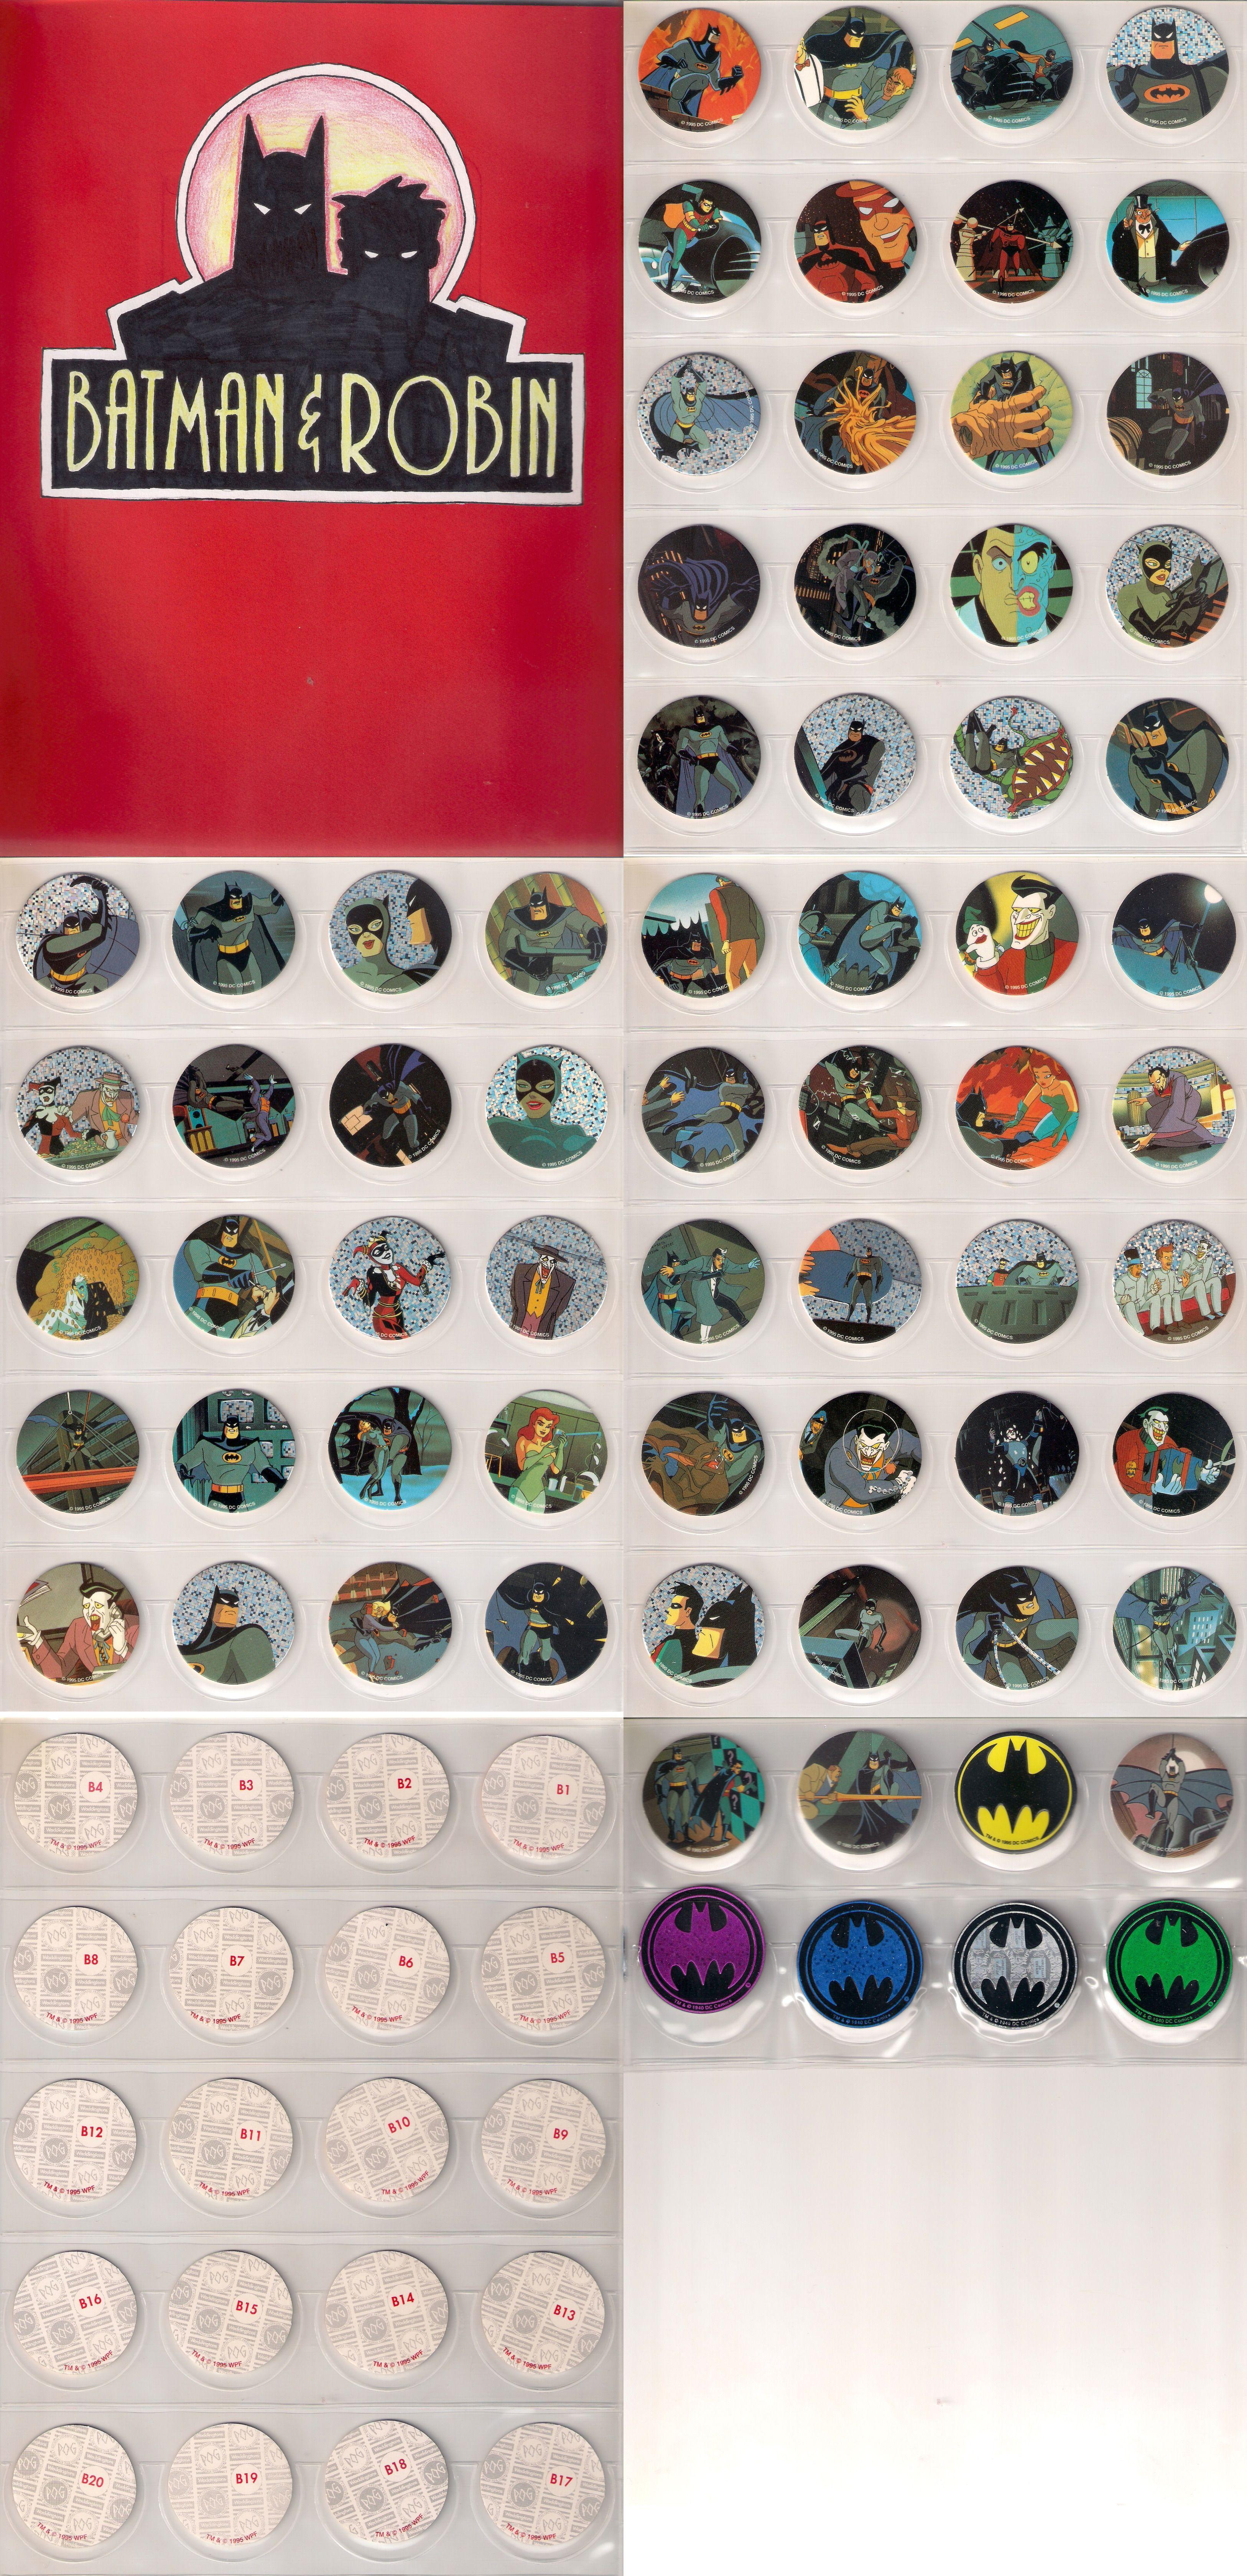 Batman & Robin Pogs by Waddington's Complete Set of 60 + 8 Slammers